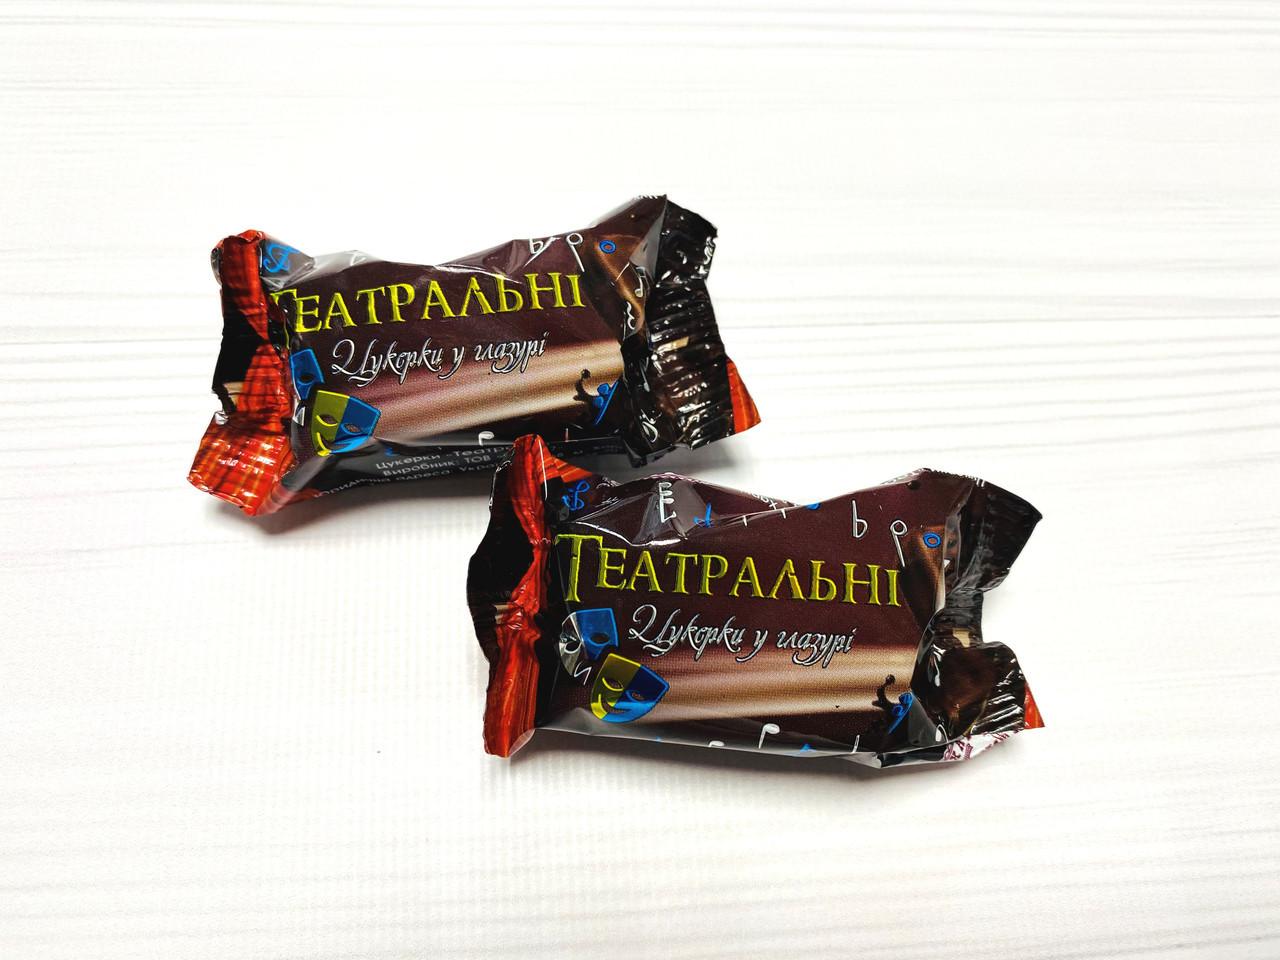 Конфеты Театральная 2,5 кг. АКЦИЯ!!!